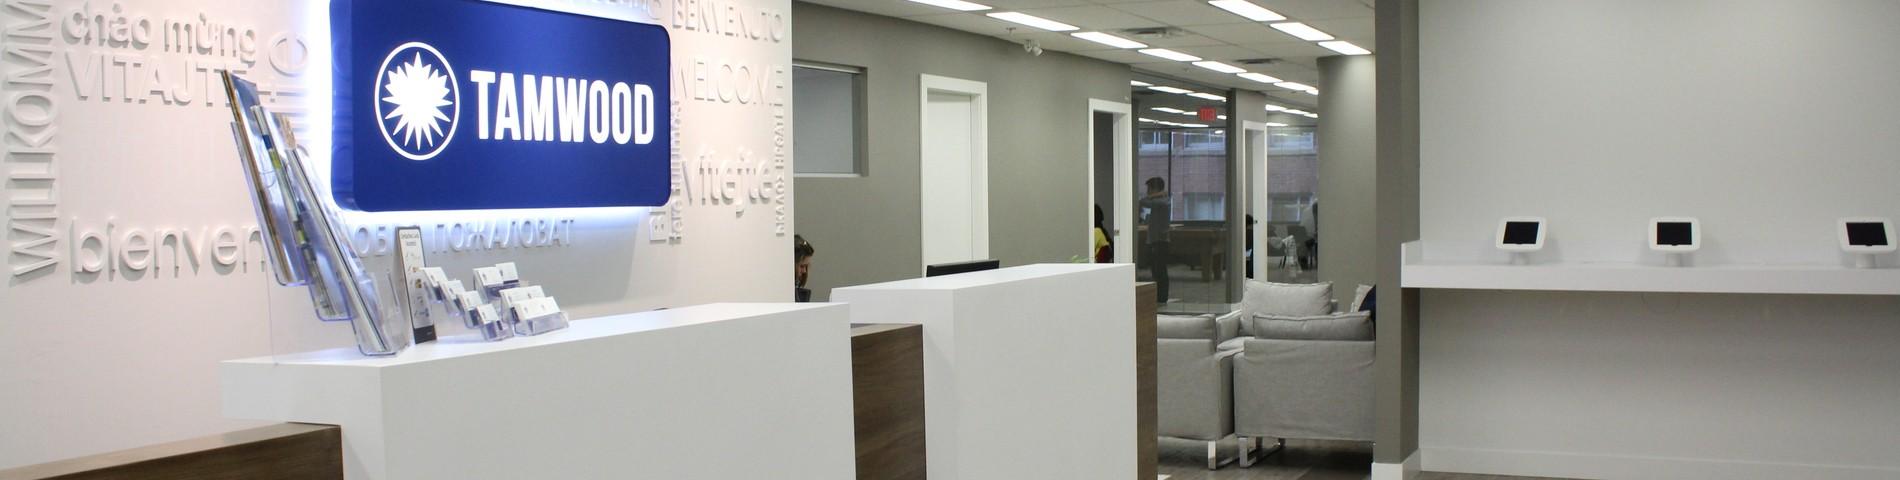 Tamwood Language Centre picture 1